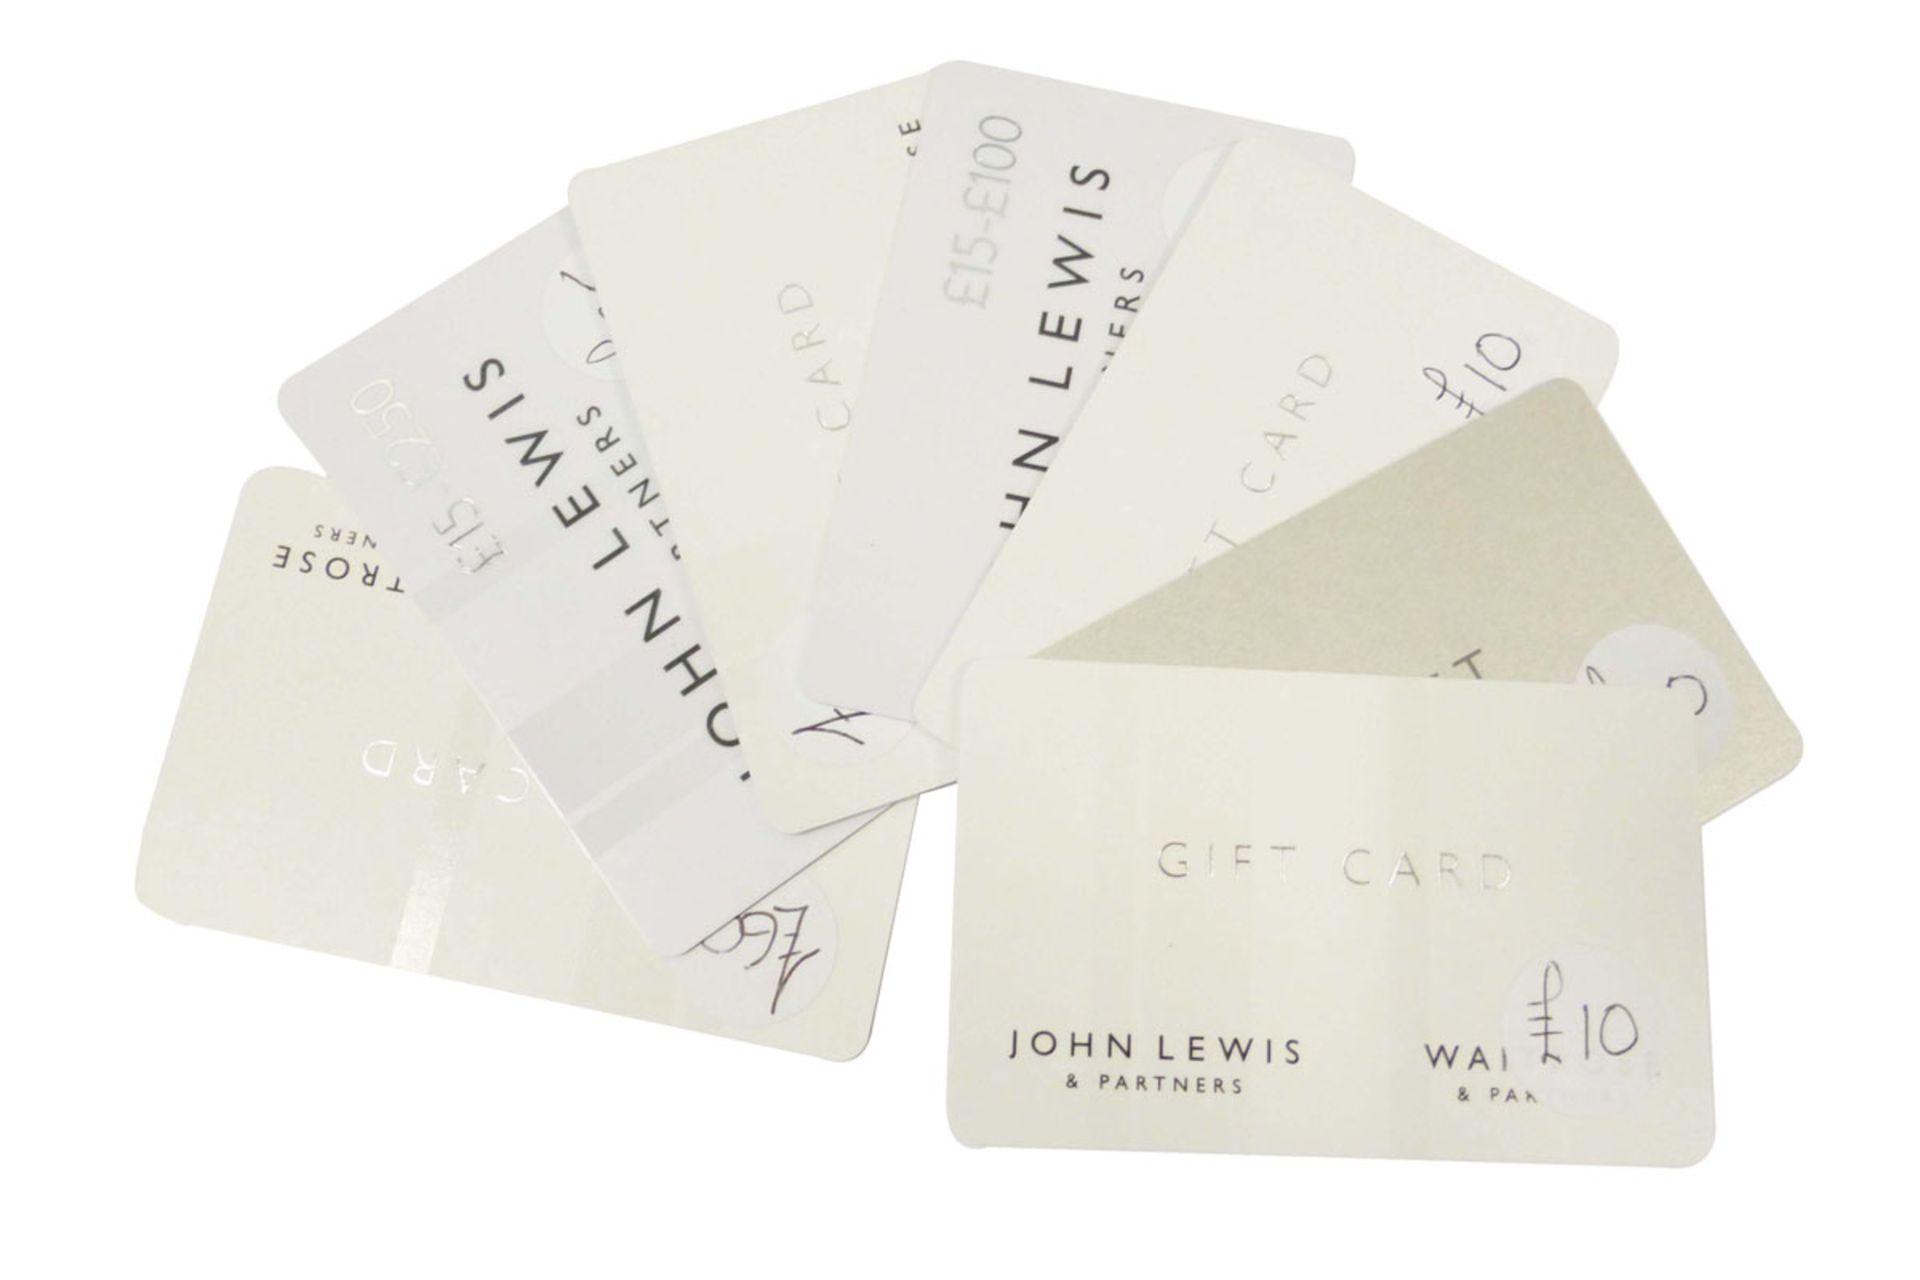 John Lewis (x7) - Total face value £180